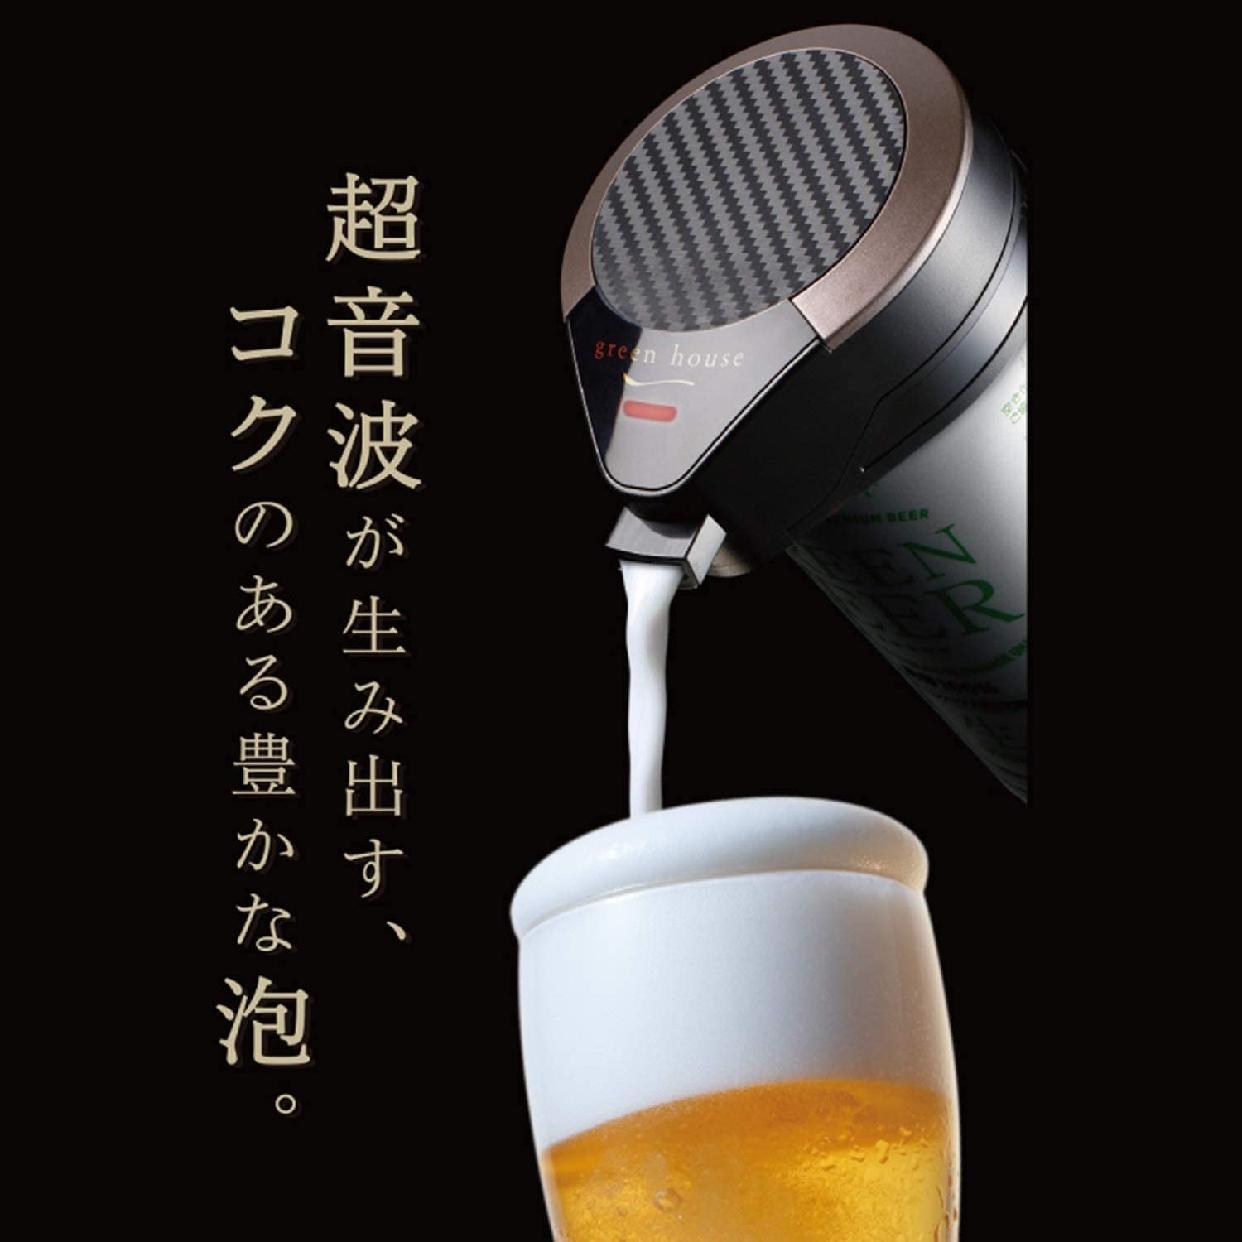 Green House(グリーンハウス)ワンタッチビールサーバーの商品画像2